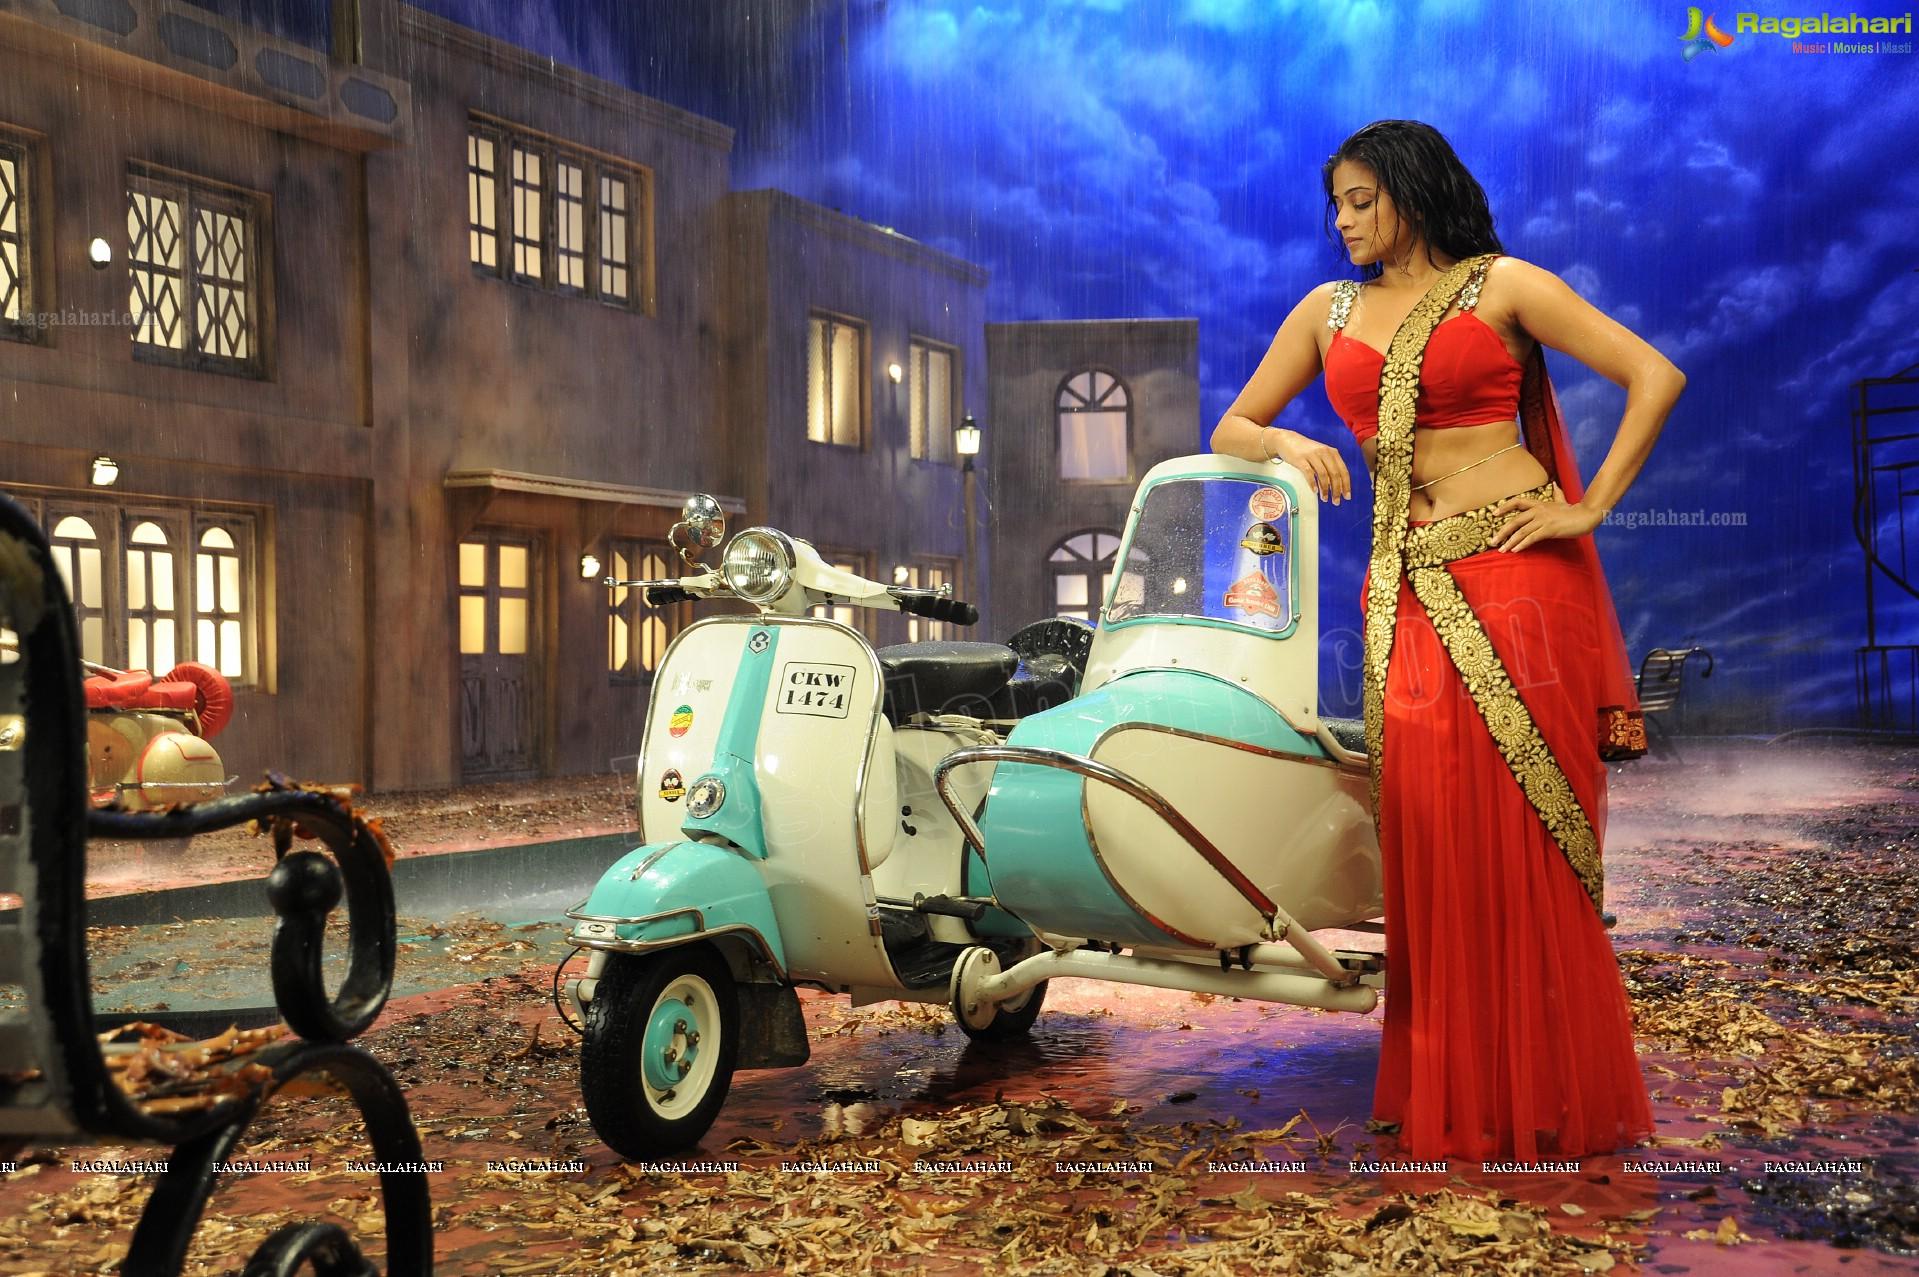 Priyamani (High Definition) Image 4 | Telugu Actor Photos